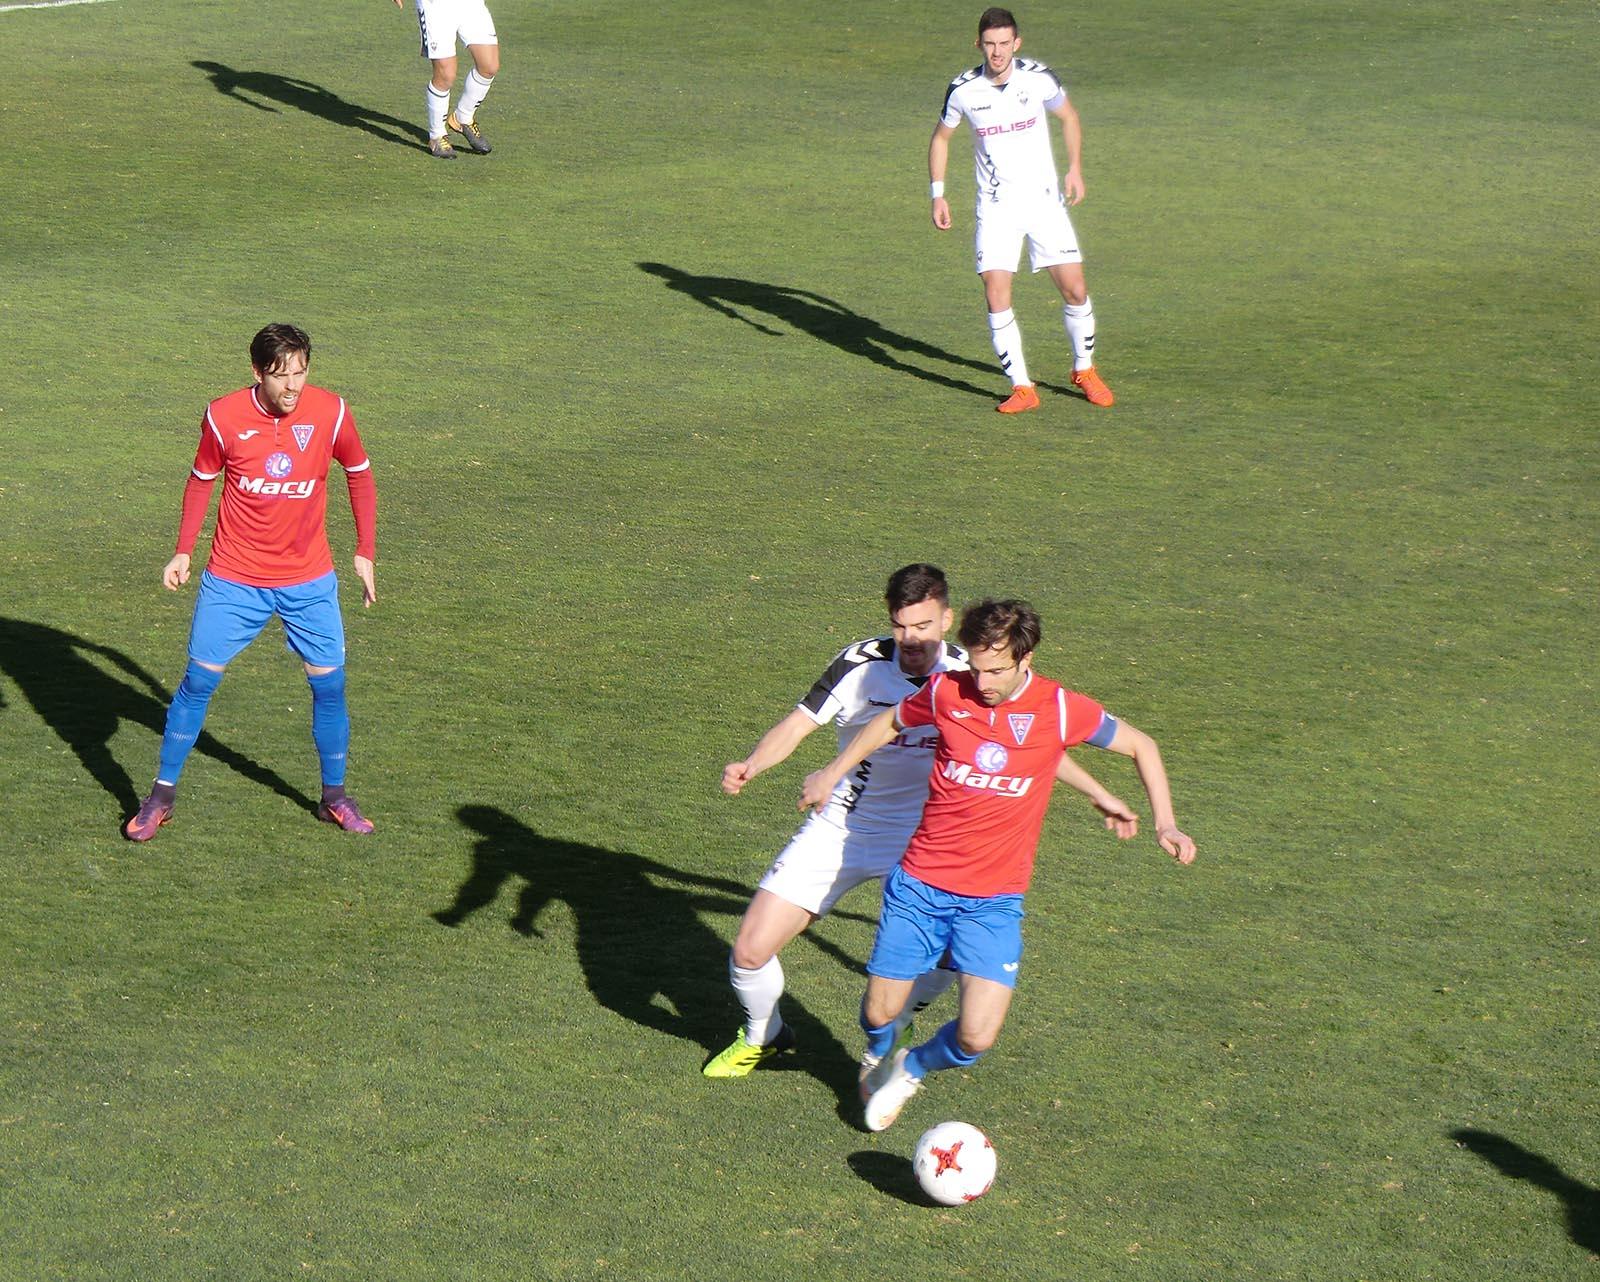 Albacete B - La Roda CF